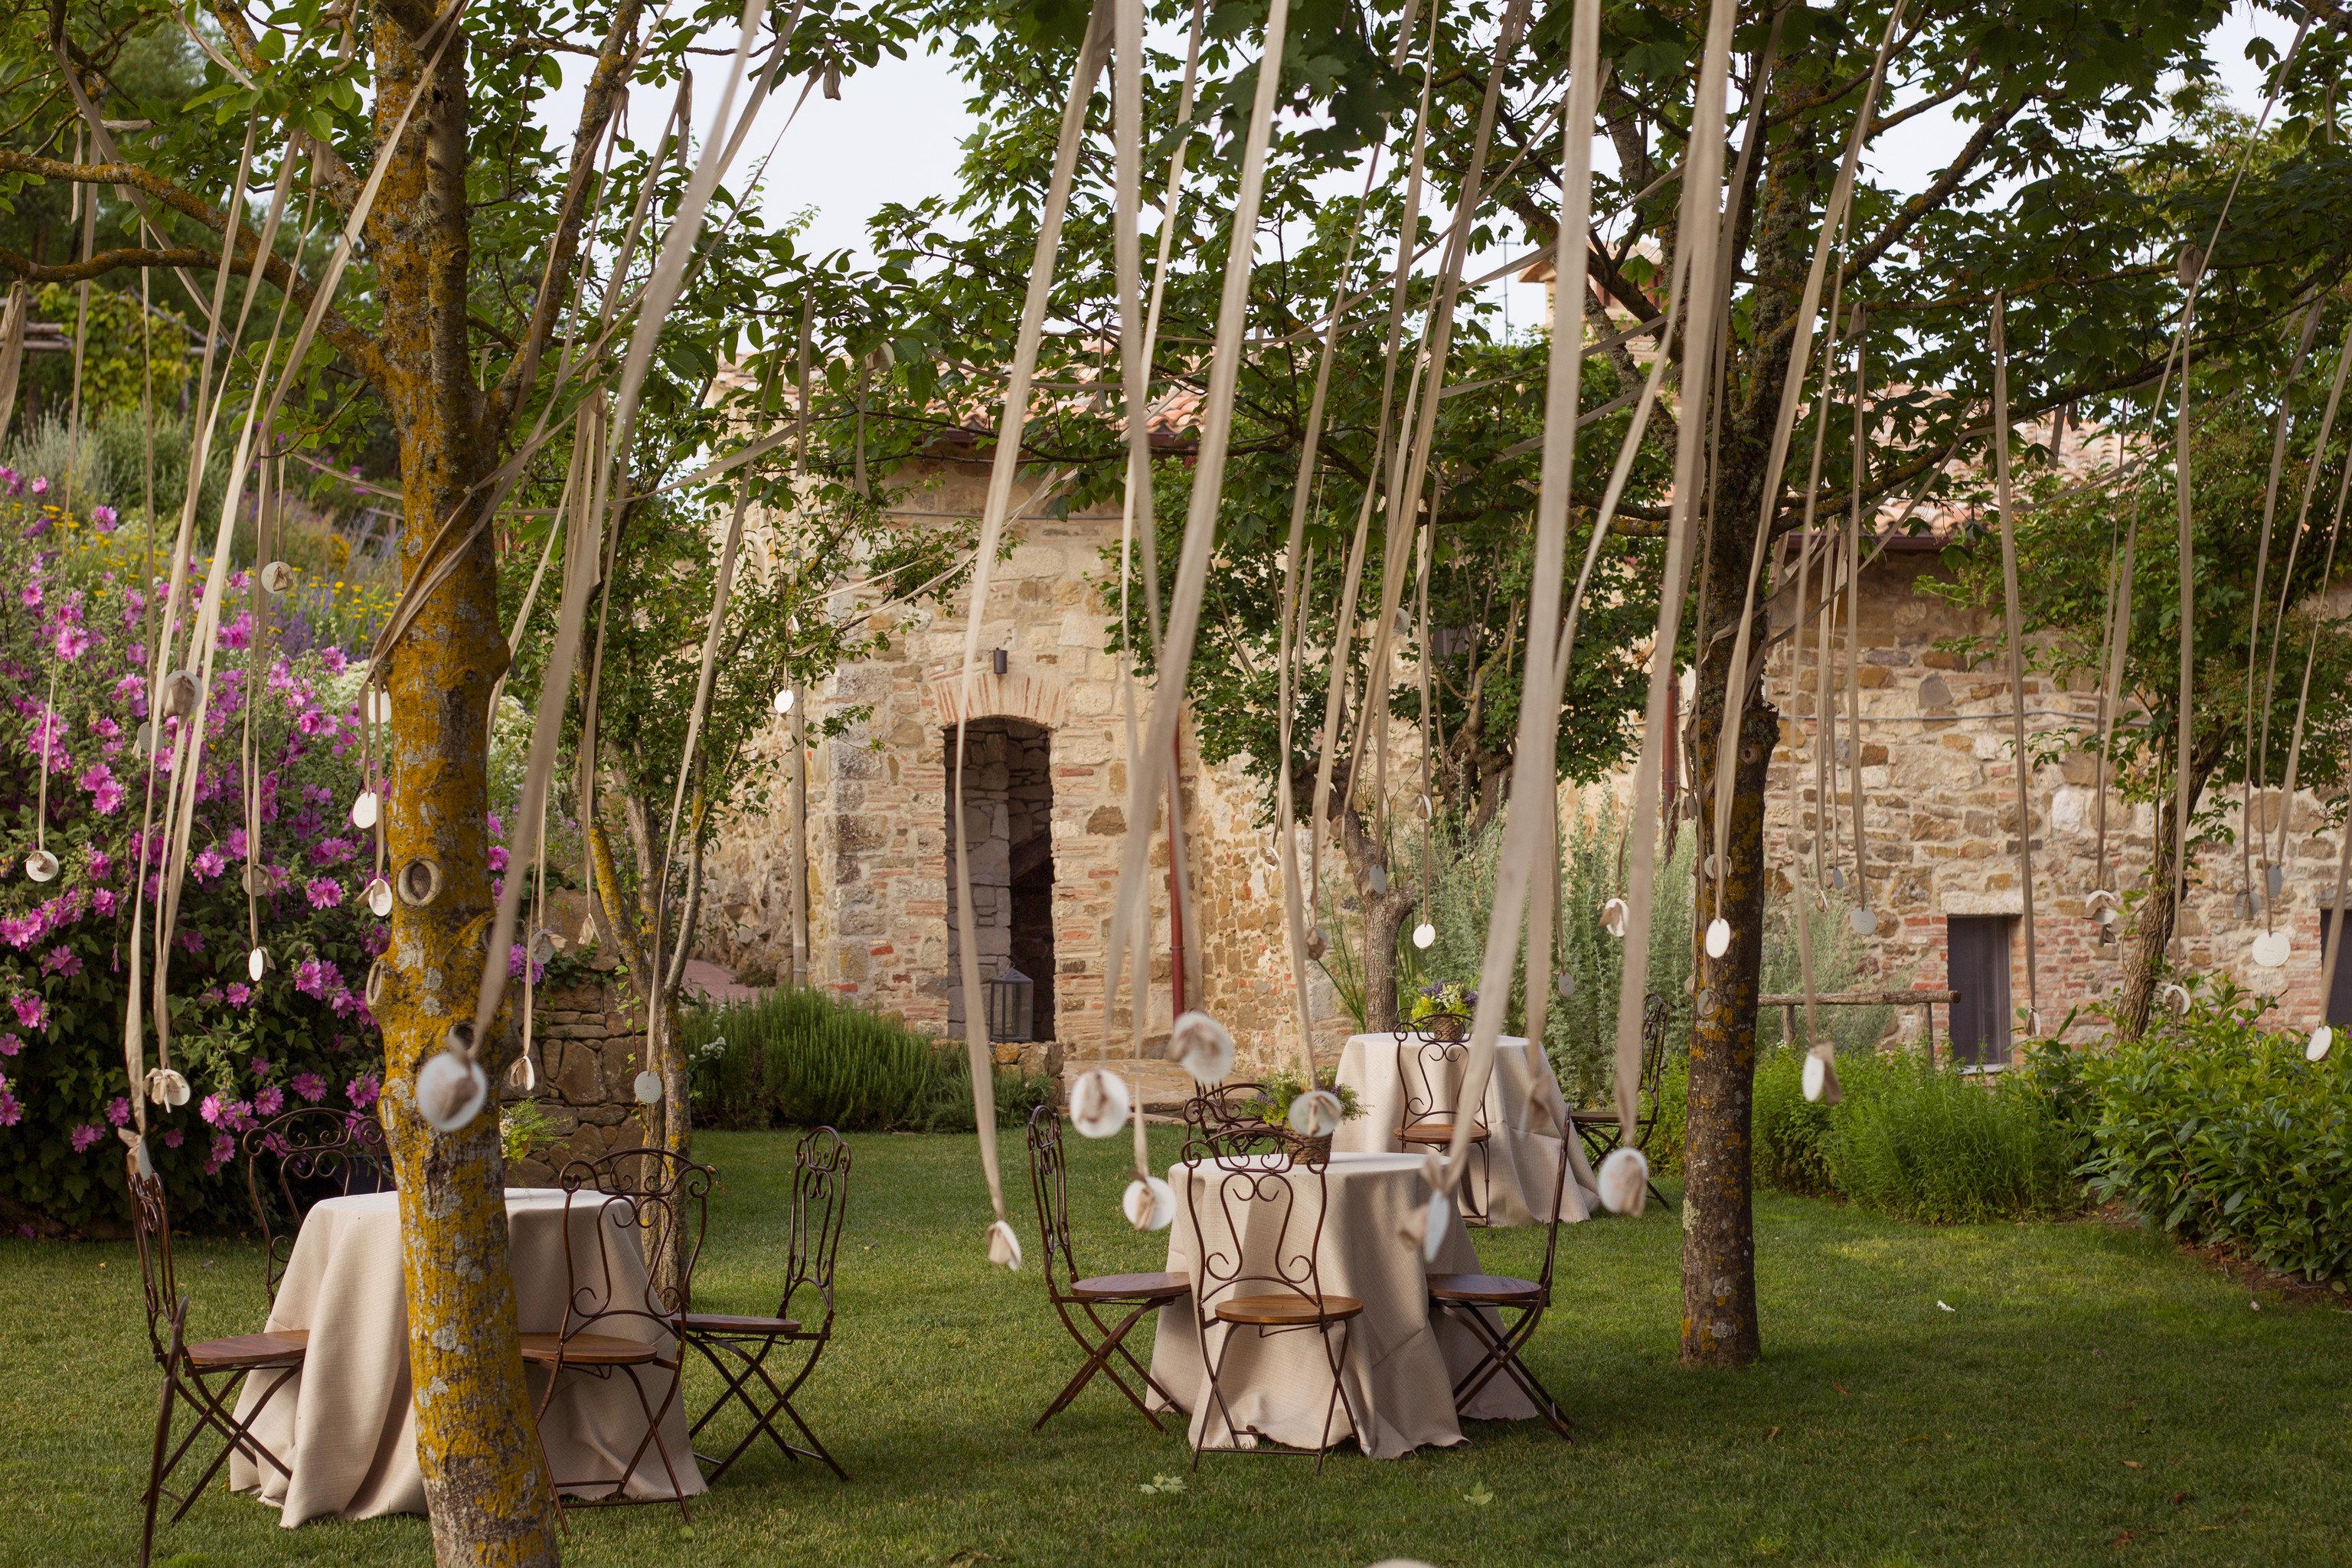 Trip Ideas grass tree outdoor chair backyard flower estate Garden lawn wedding yard ceremony aisle plant area